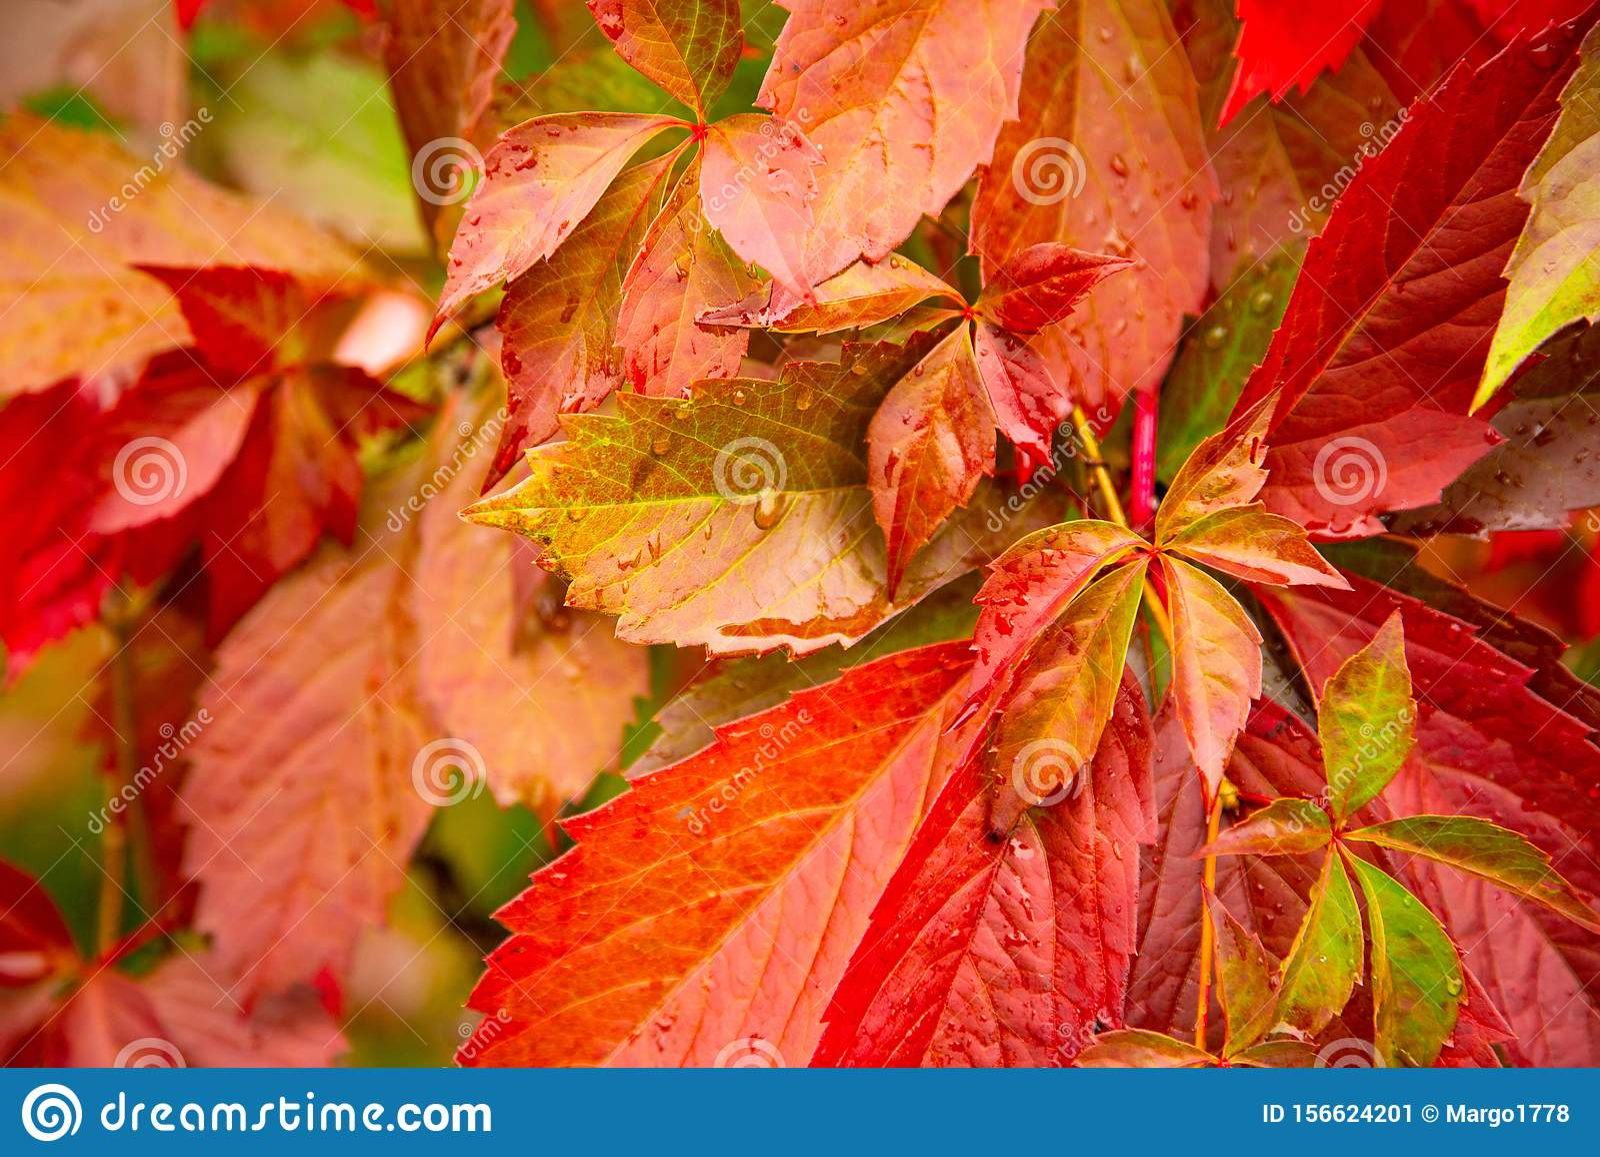 Red Autumn Leaves Background Stock Image Image Of Orange Harvest 156624201